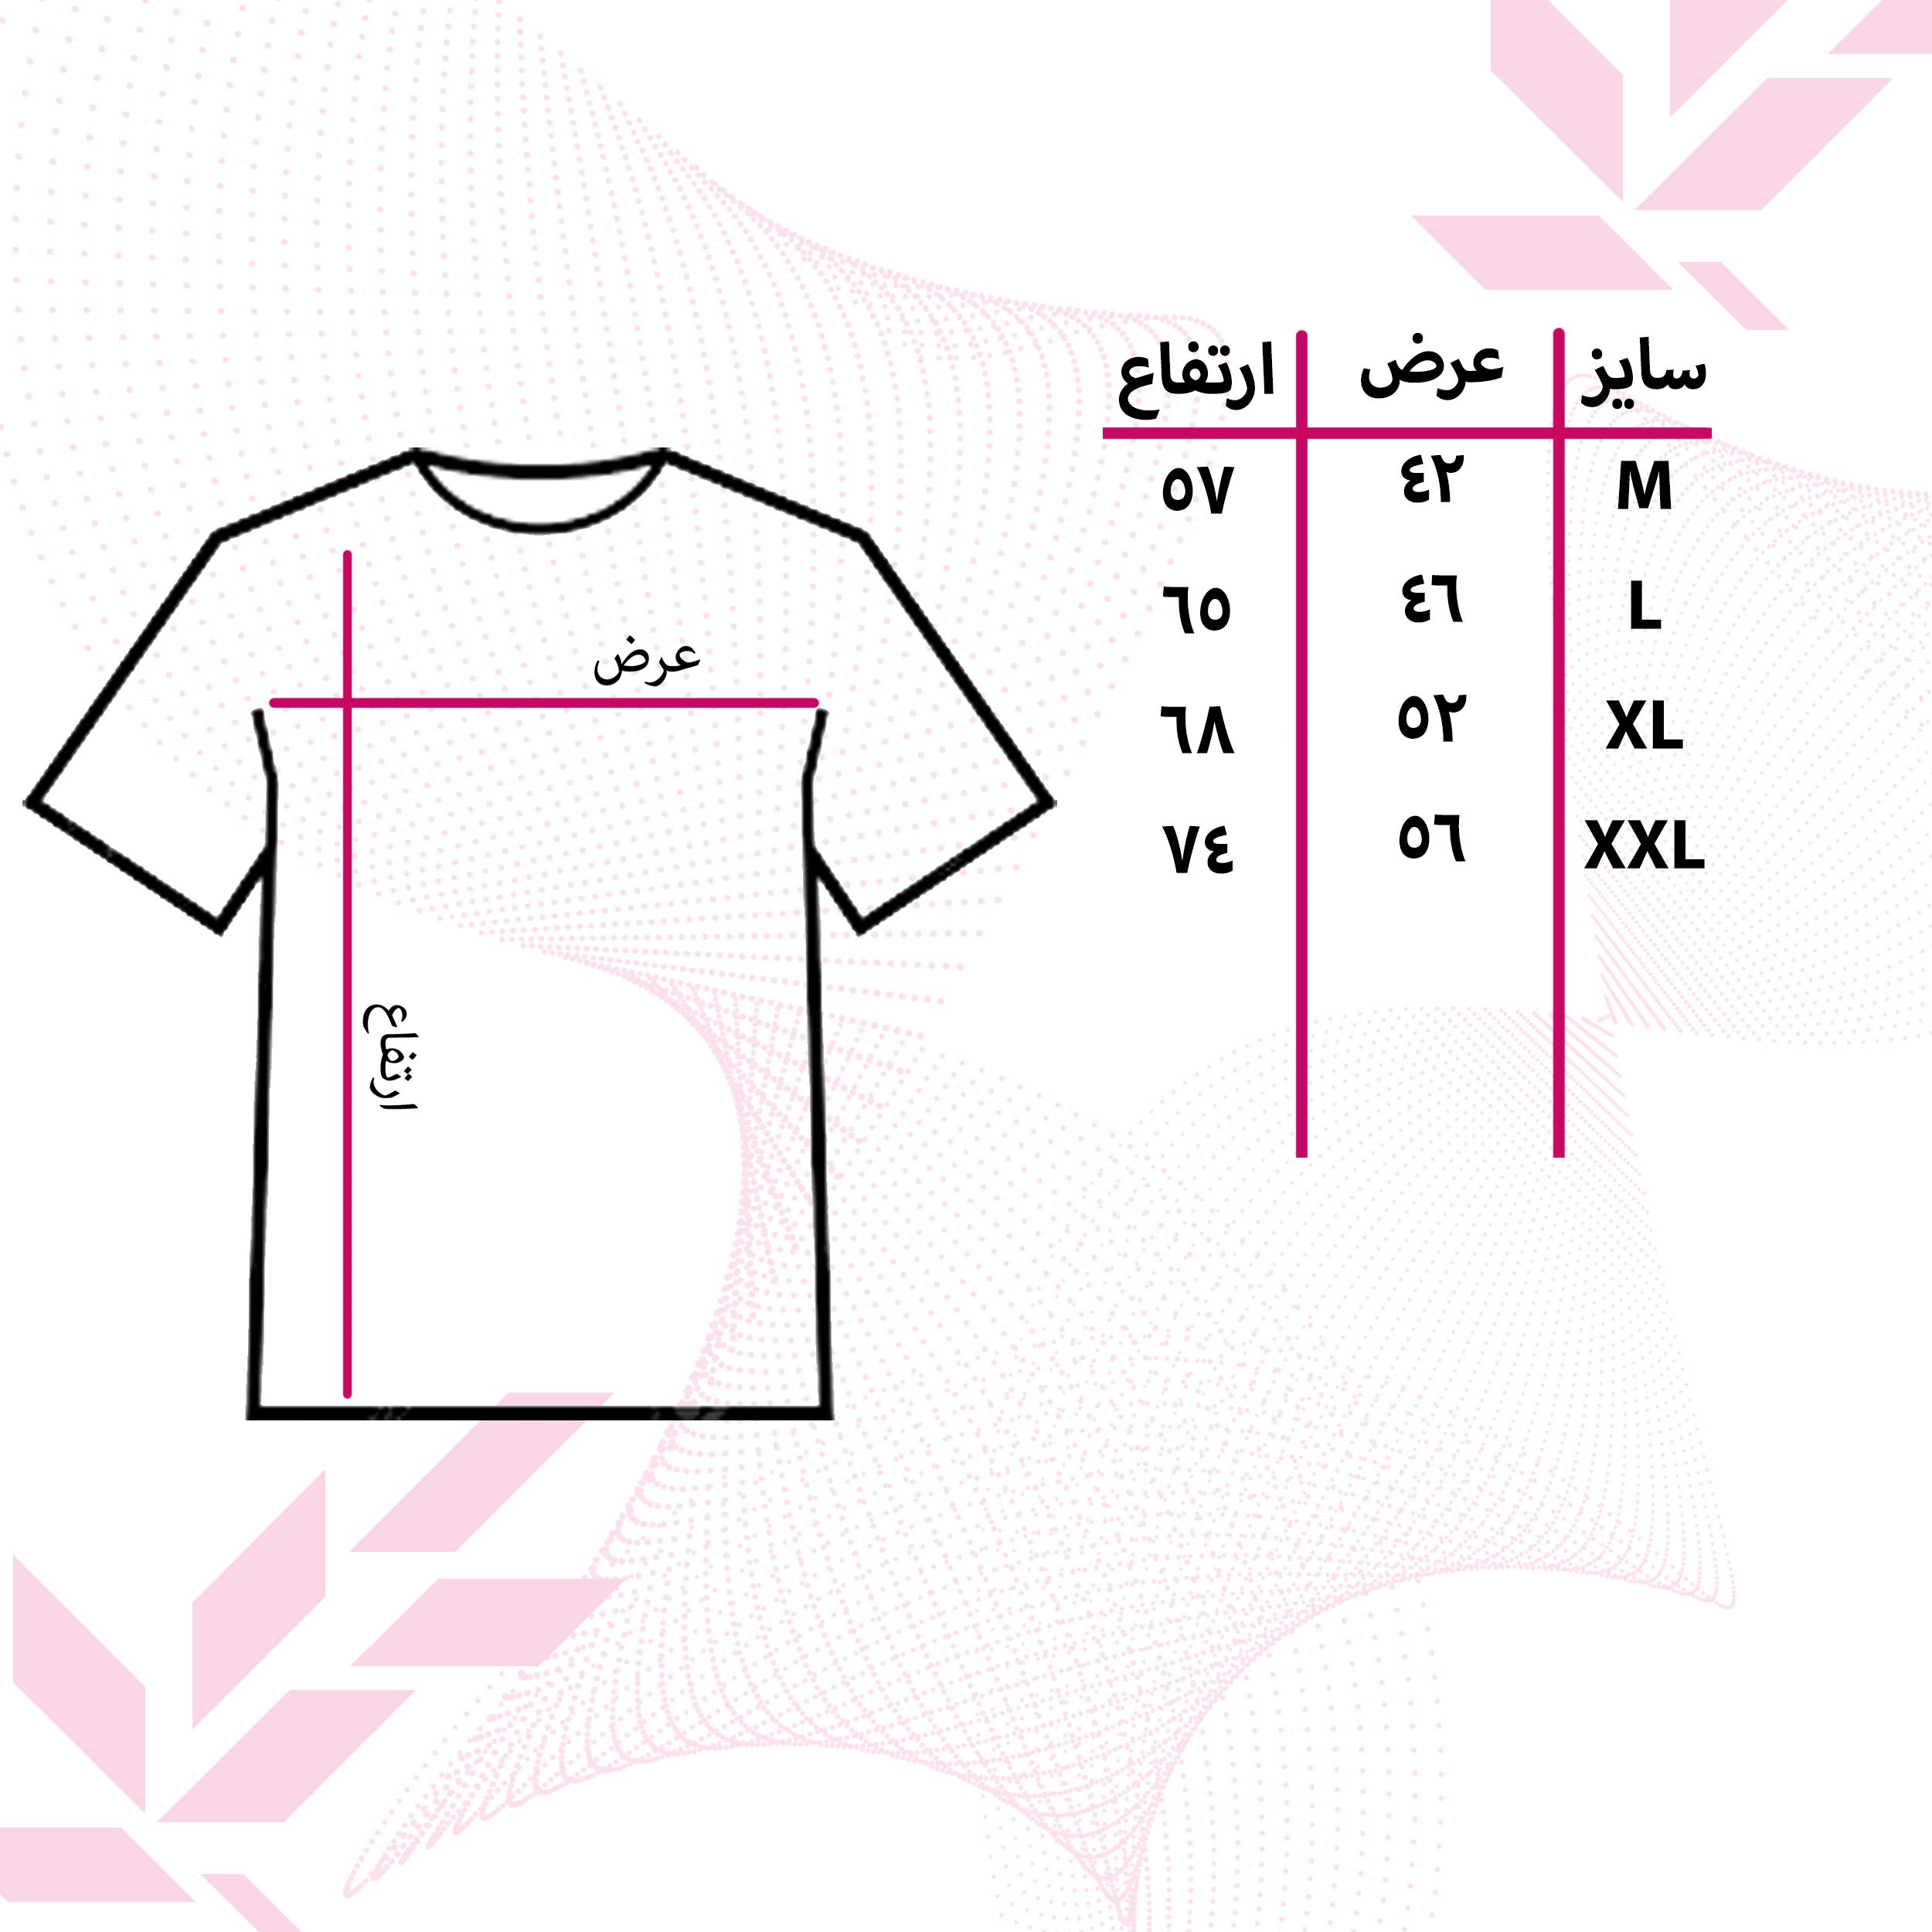 تیشرت زنانه 27 طرح FLOWER کد J23 -  - 5